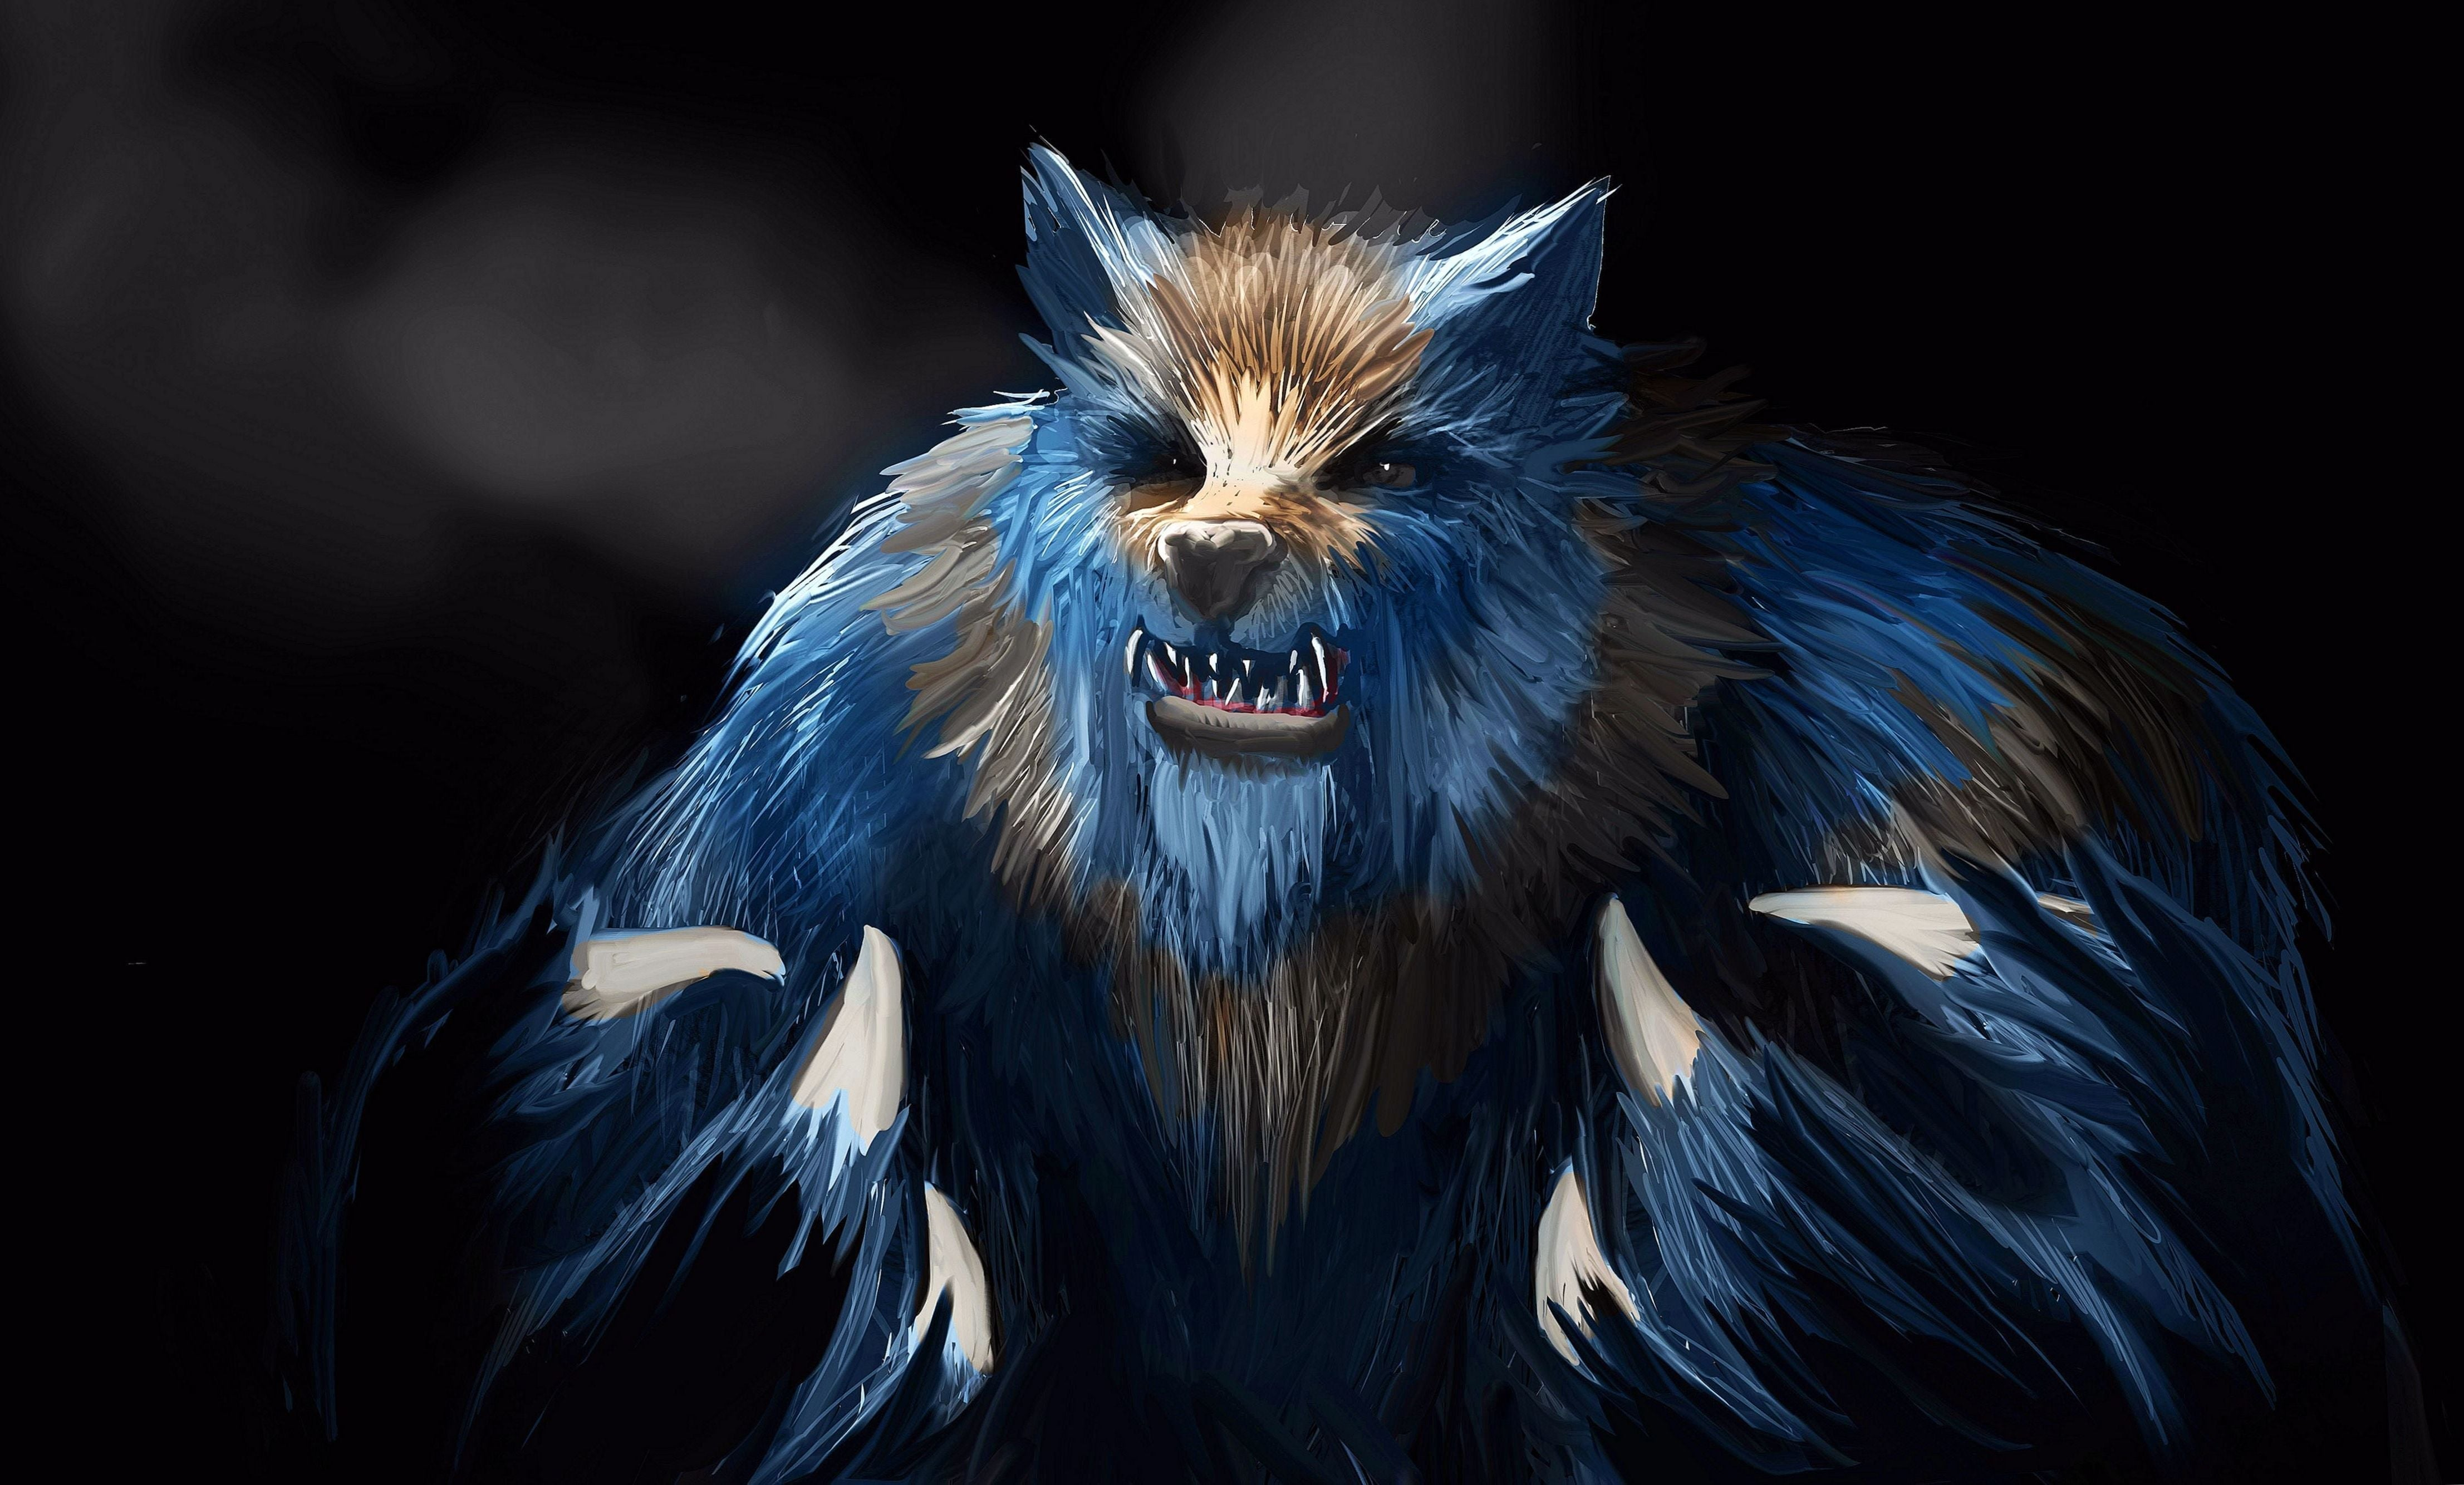 Wallpapers 4k Ultra Hd Werewolf - Ultra Hd Wolf Wallpapers 4k , HD Wallpaper & Backgrounds